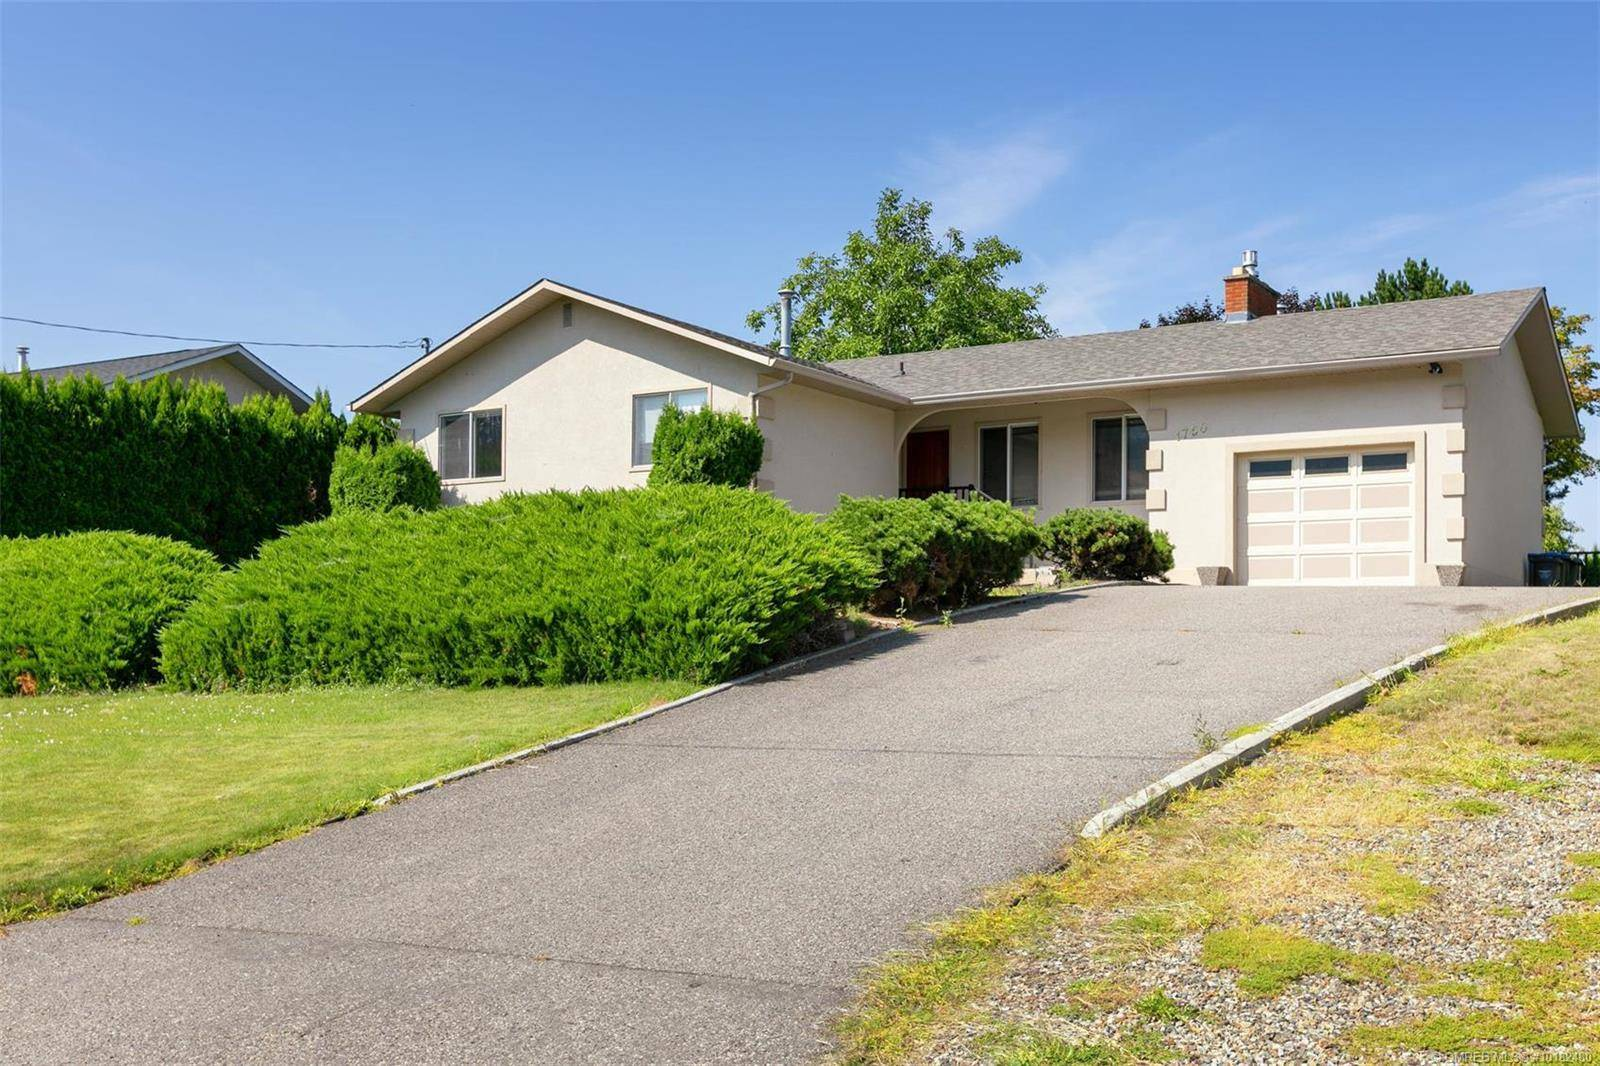 House for sale at 1750 Hayashi Rd Kelowna British Columbia - MLS: 10182480